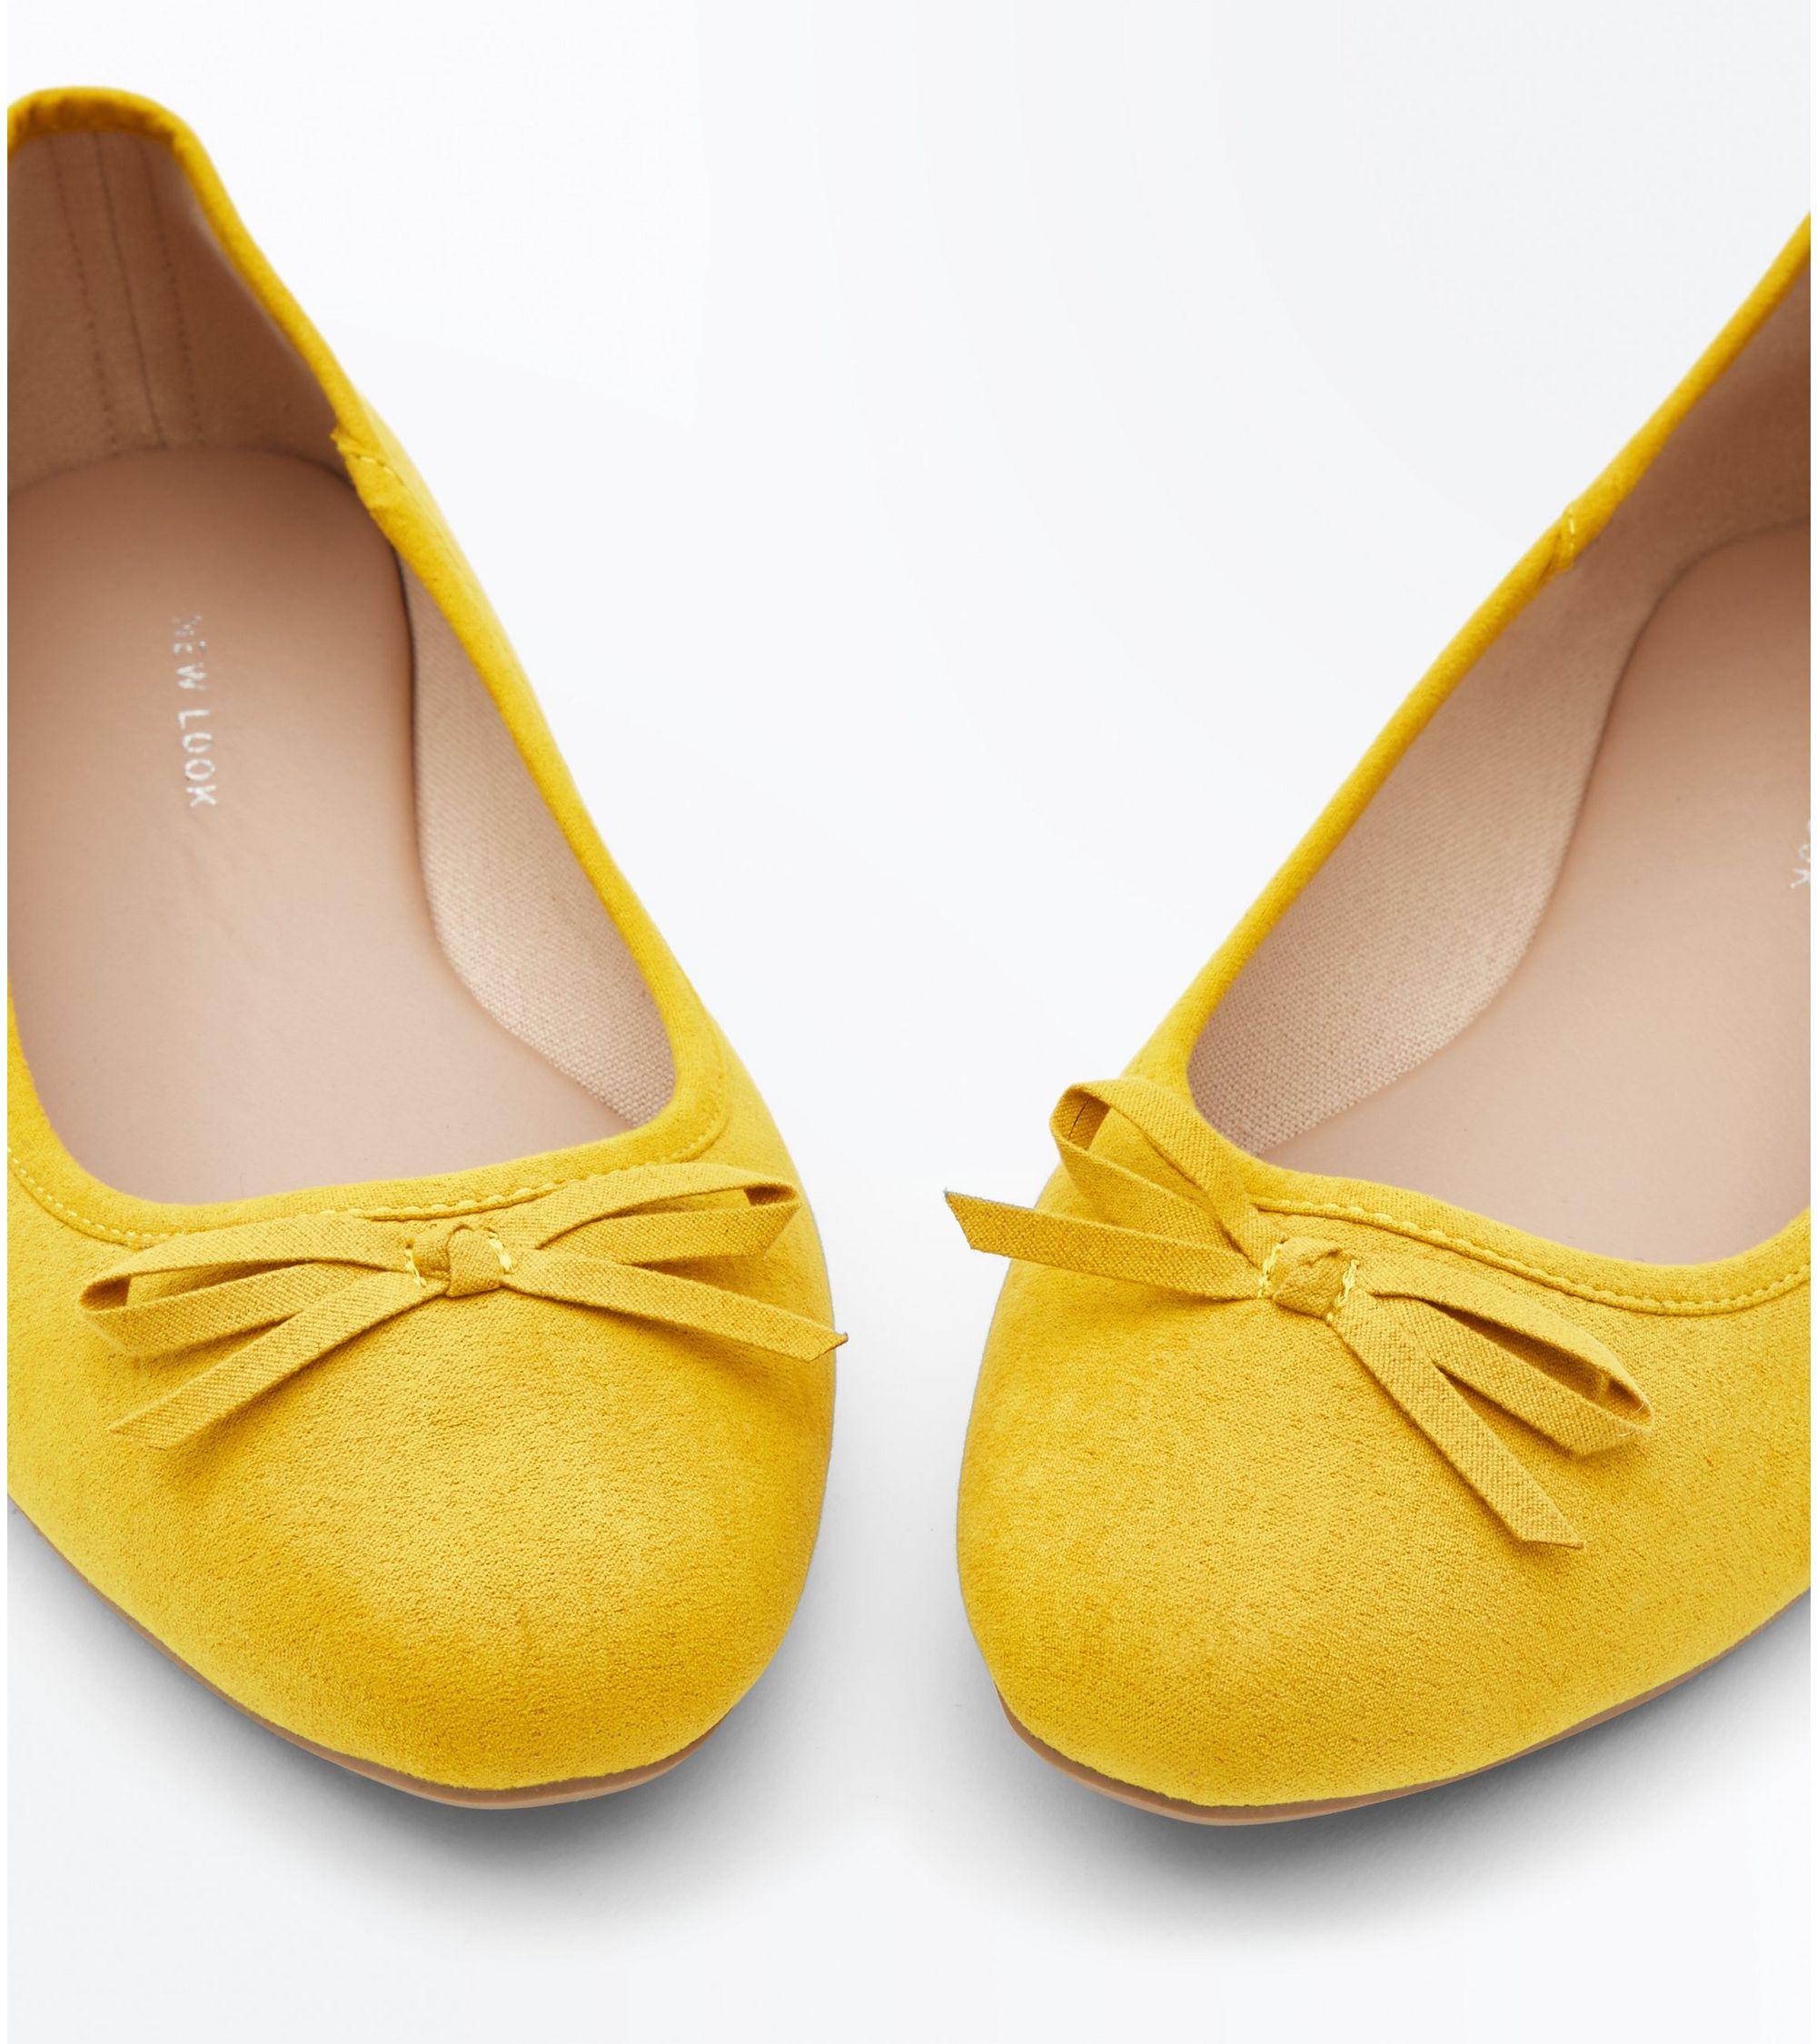 ec357cf8323b New Look Wide Fit Mustard Suedette Ballet Pumps at £9.99